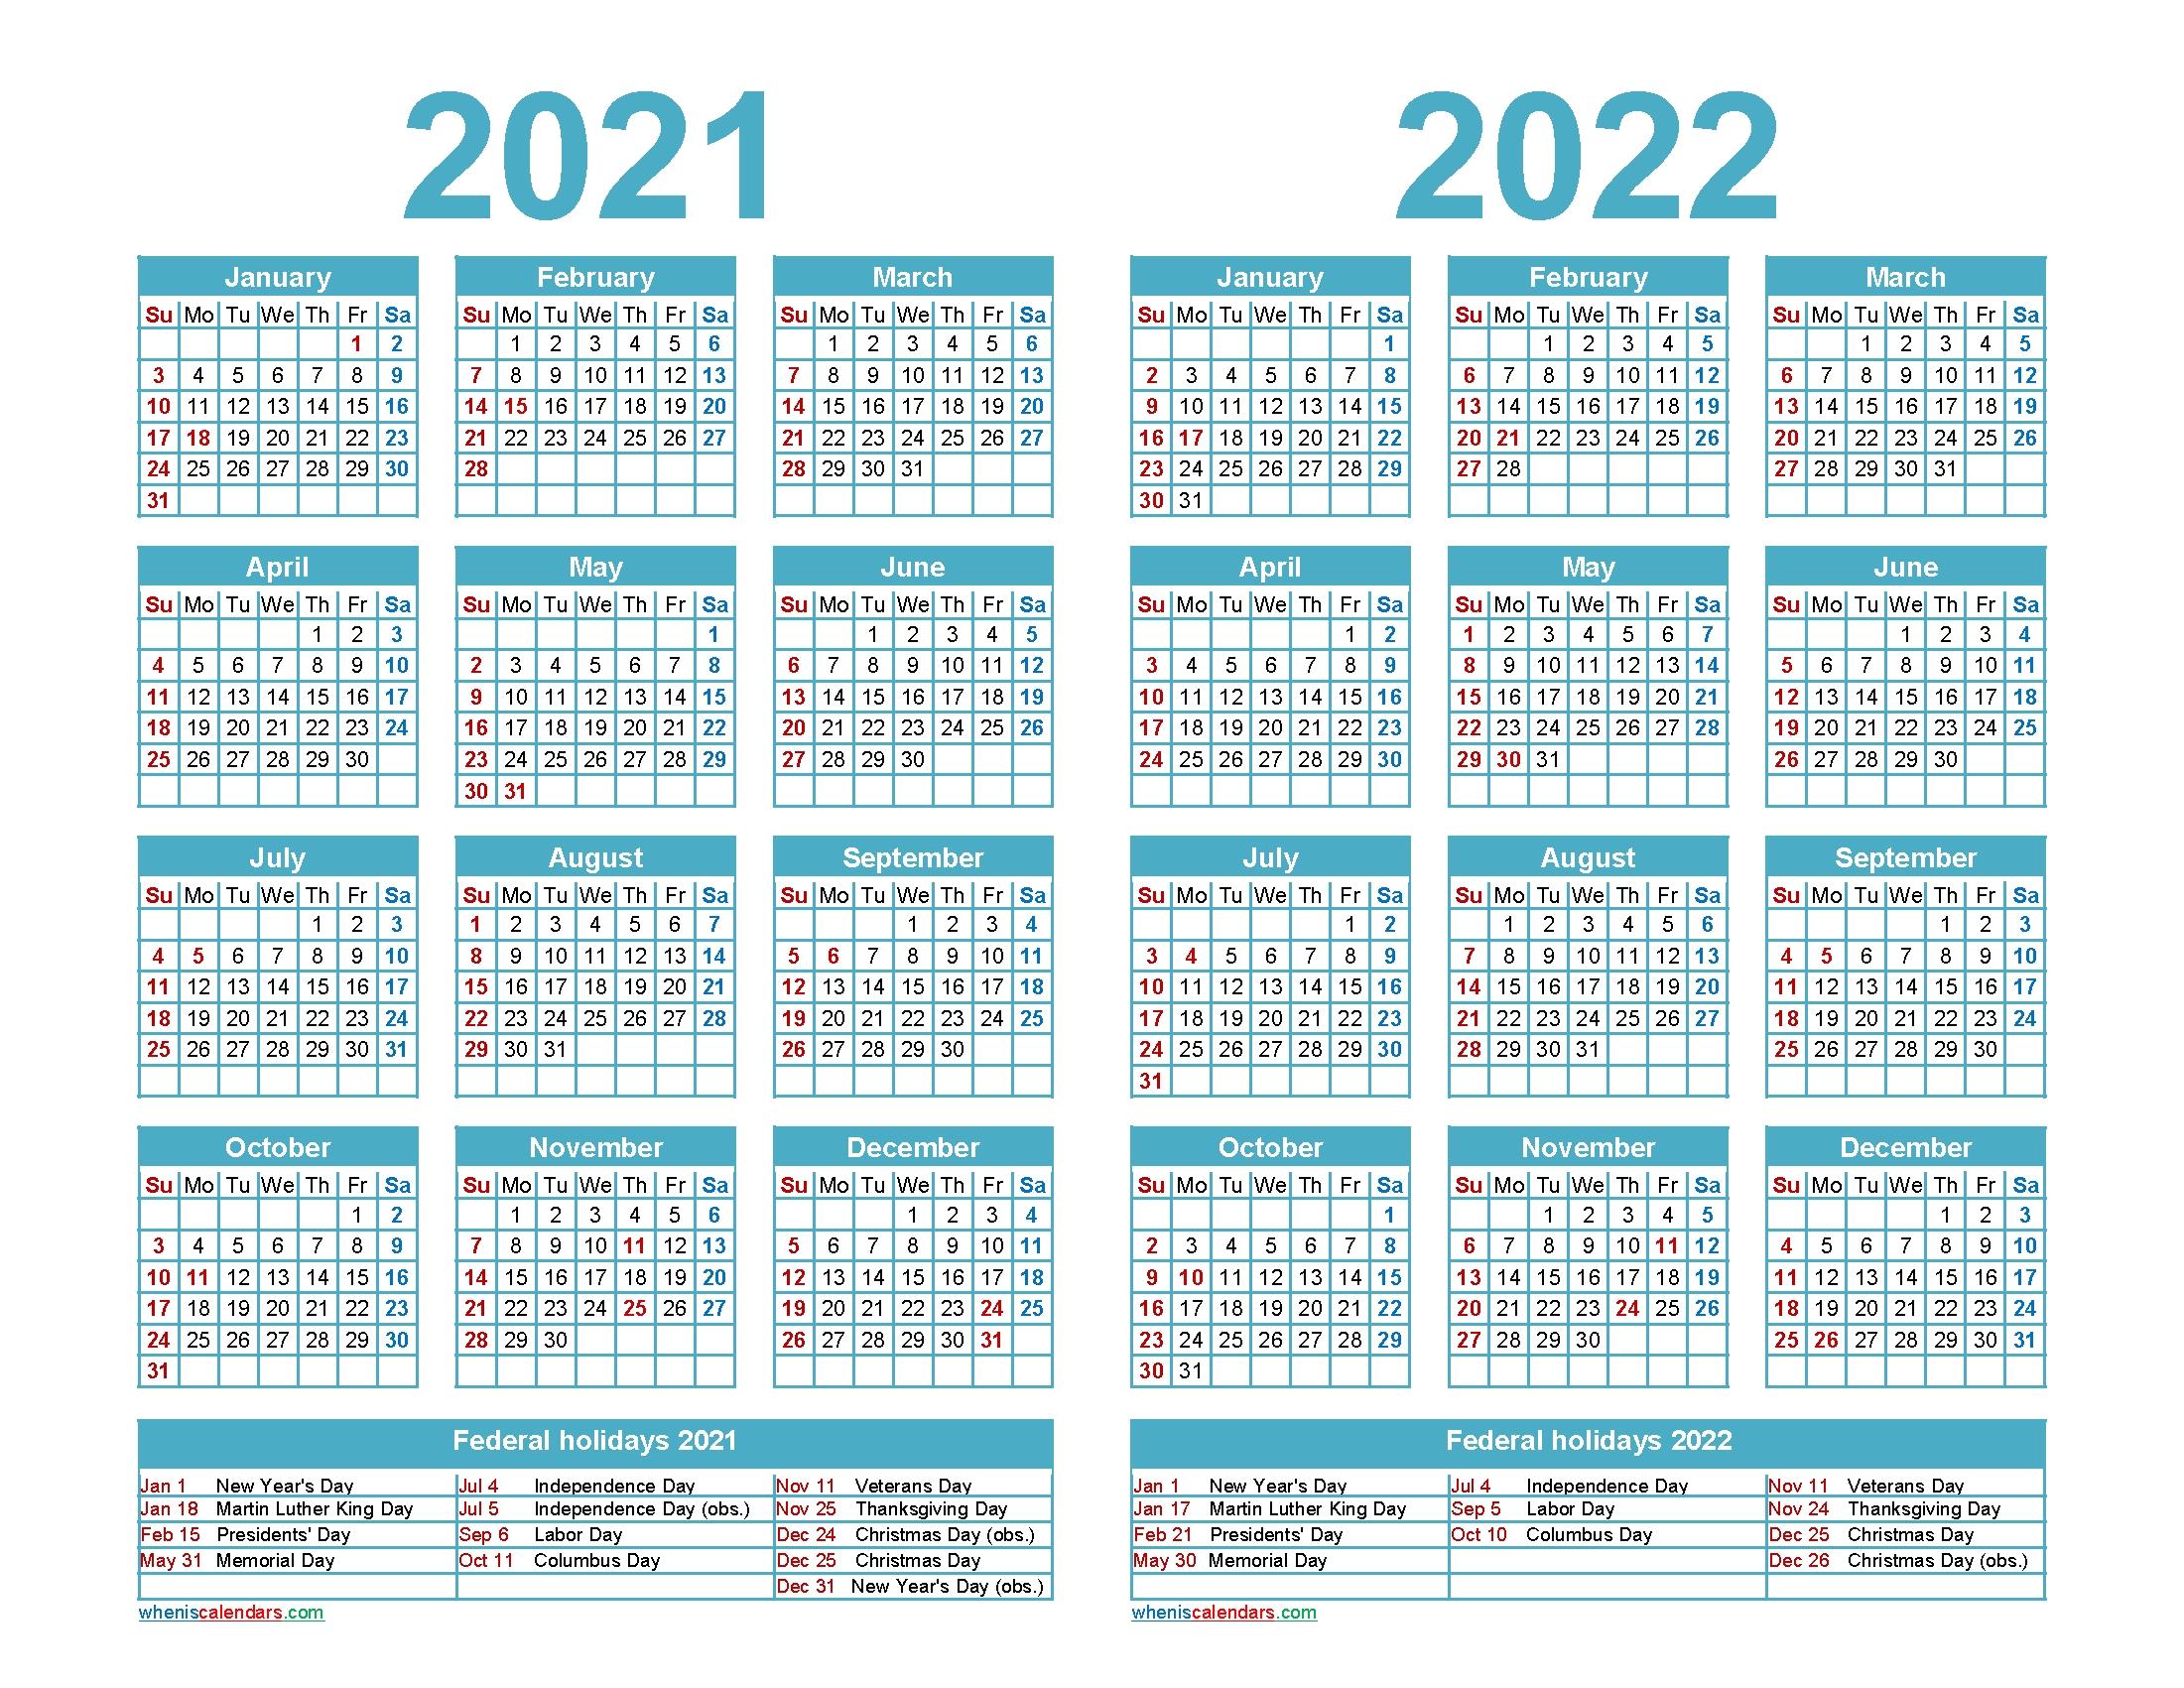 Free 2021 And 2022 Calendar Printable Word, Pdf